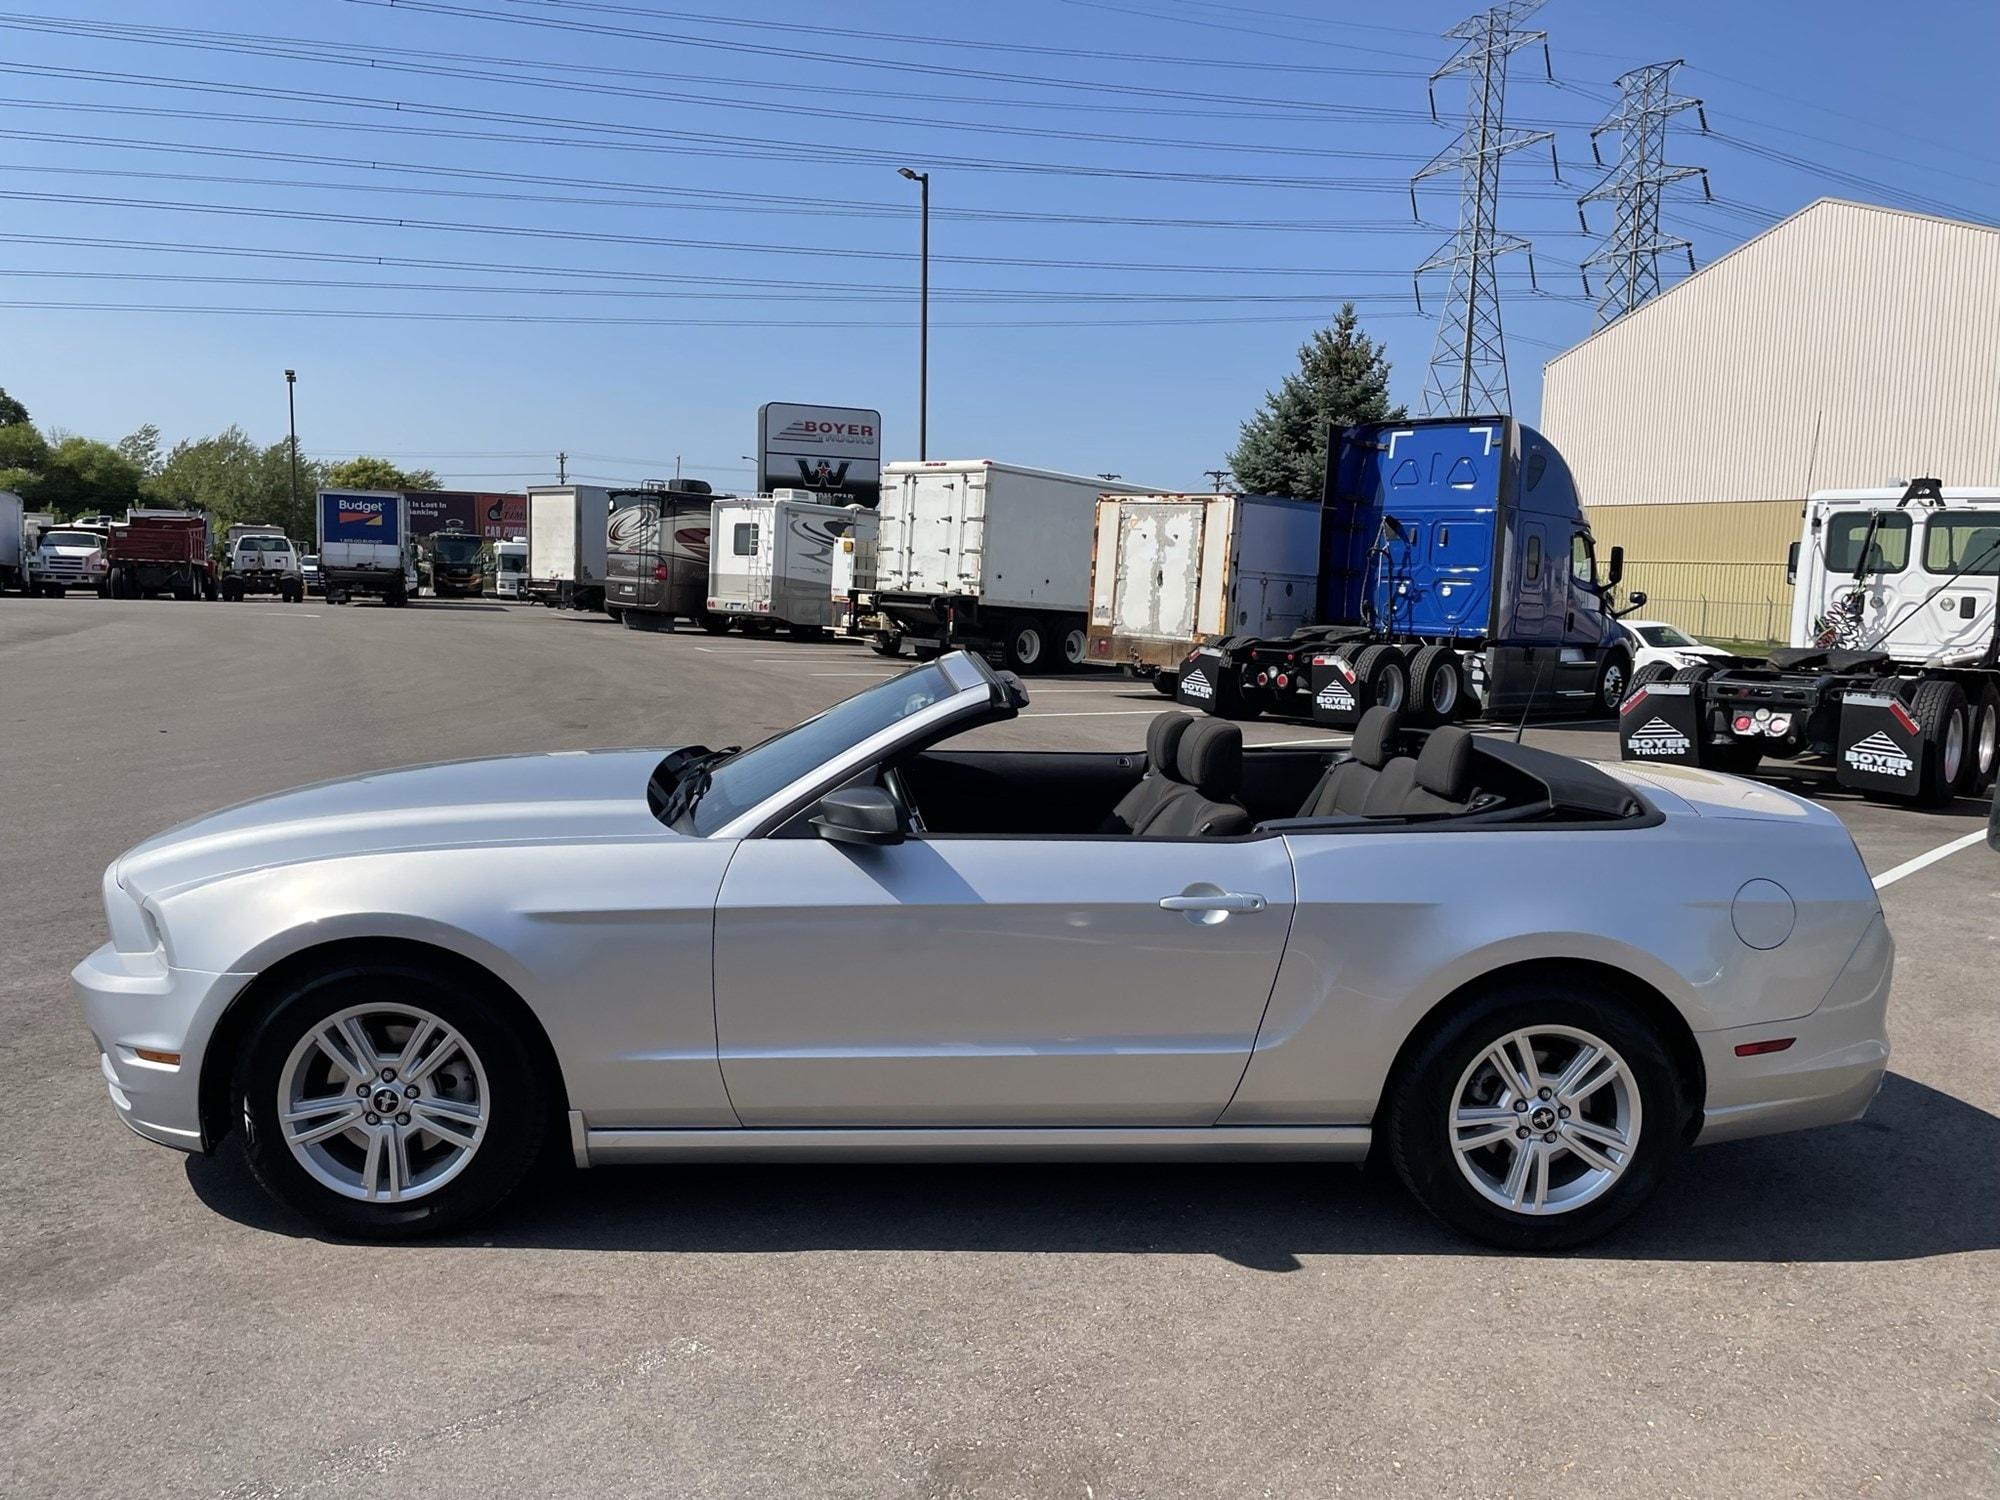 Used 2014 Ford Mustang V6 Premium with VIN 1ZVBP8EM3E5300198 for sale in Minneapolis, Minnesota